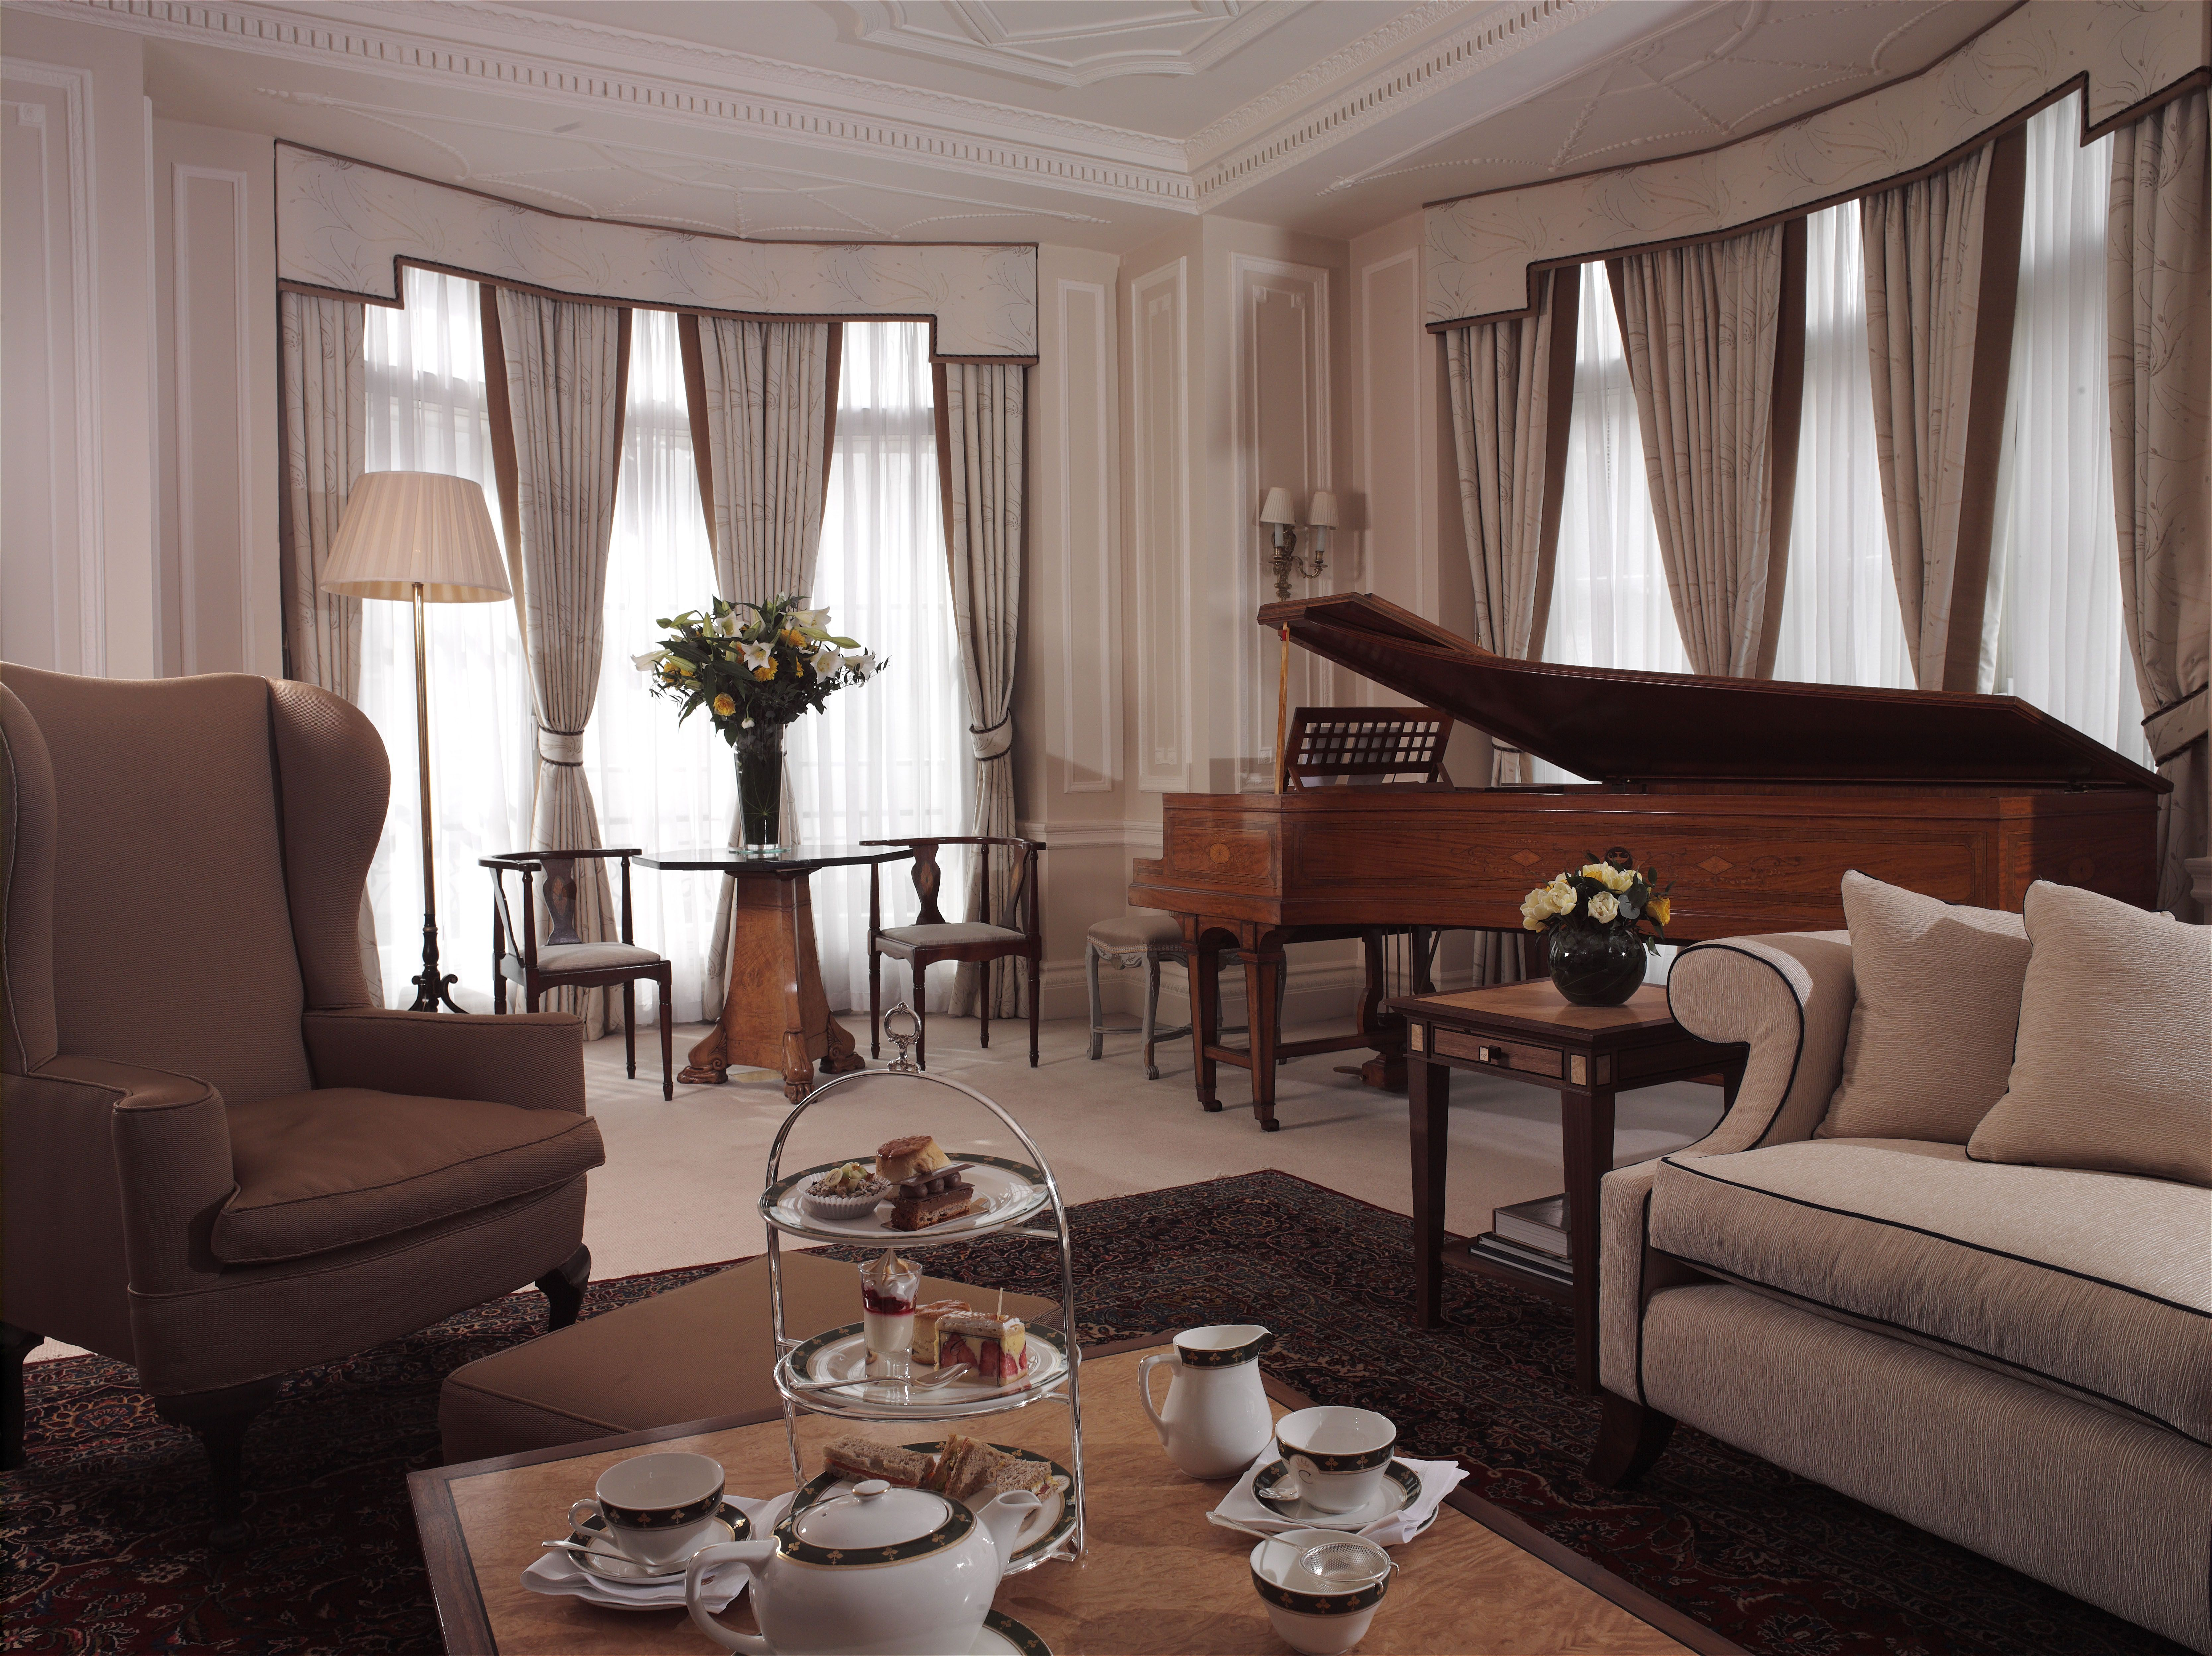 Claridge's Royal Suite in London oozes class